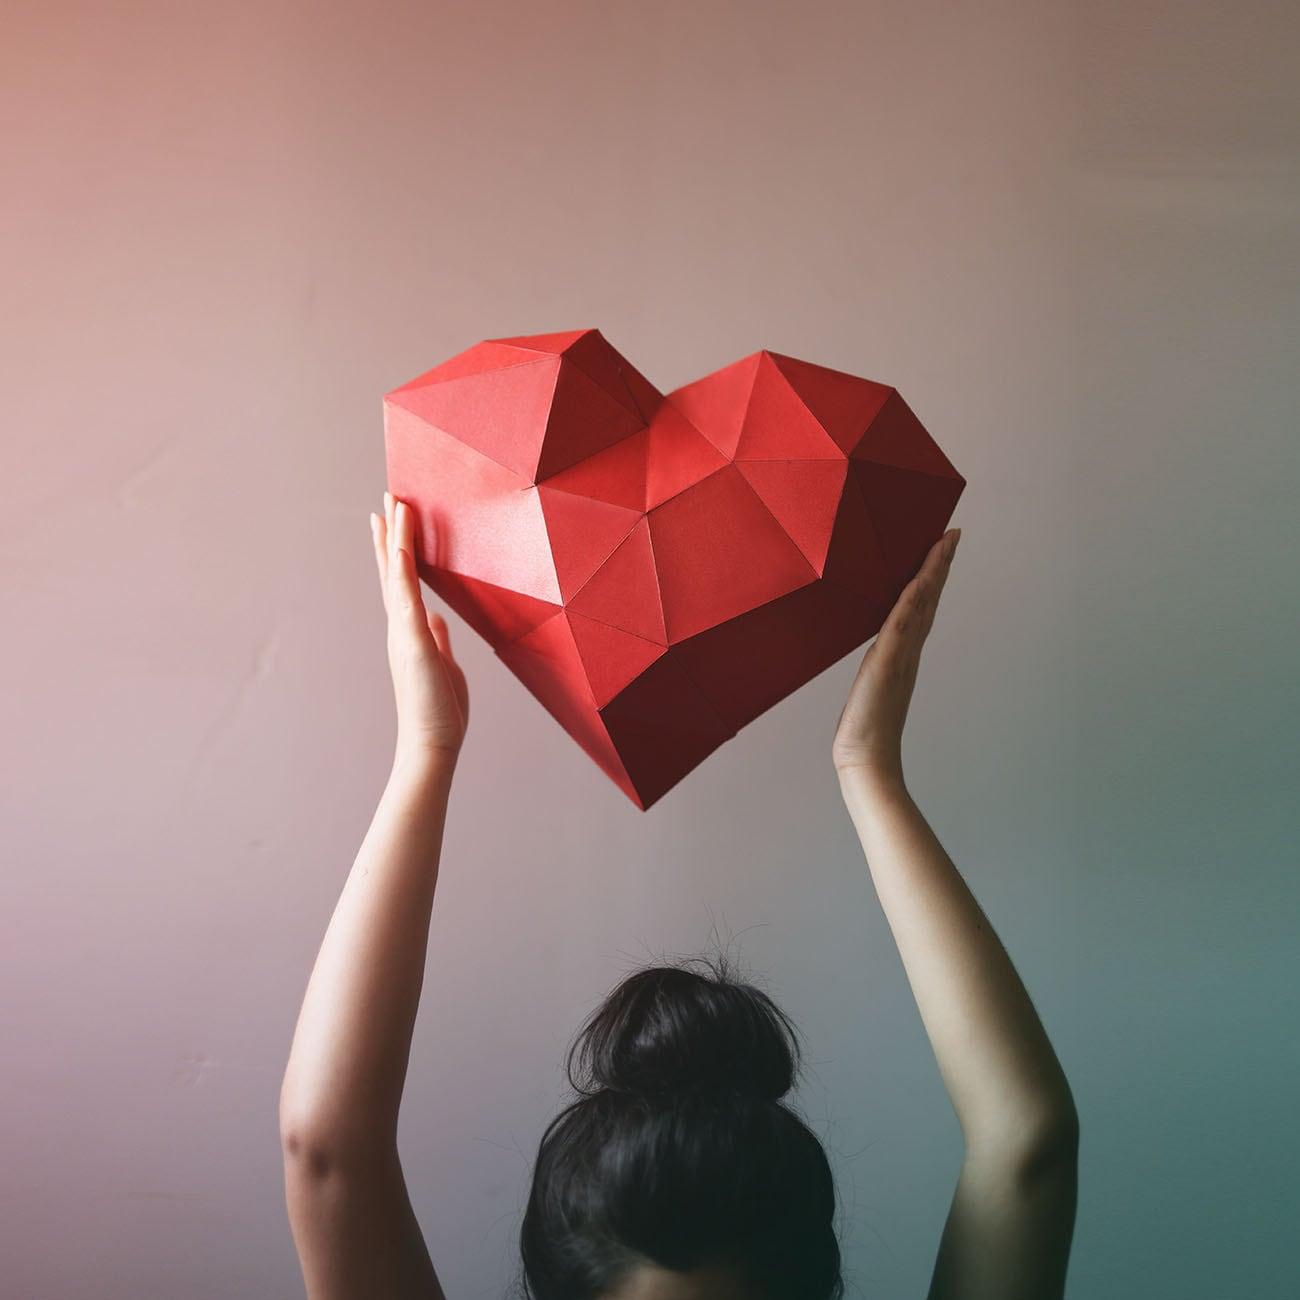 3d geometric heart paper craft low poly paper craft zoom jeuxipadfo Images